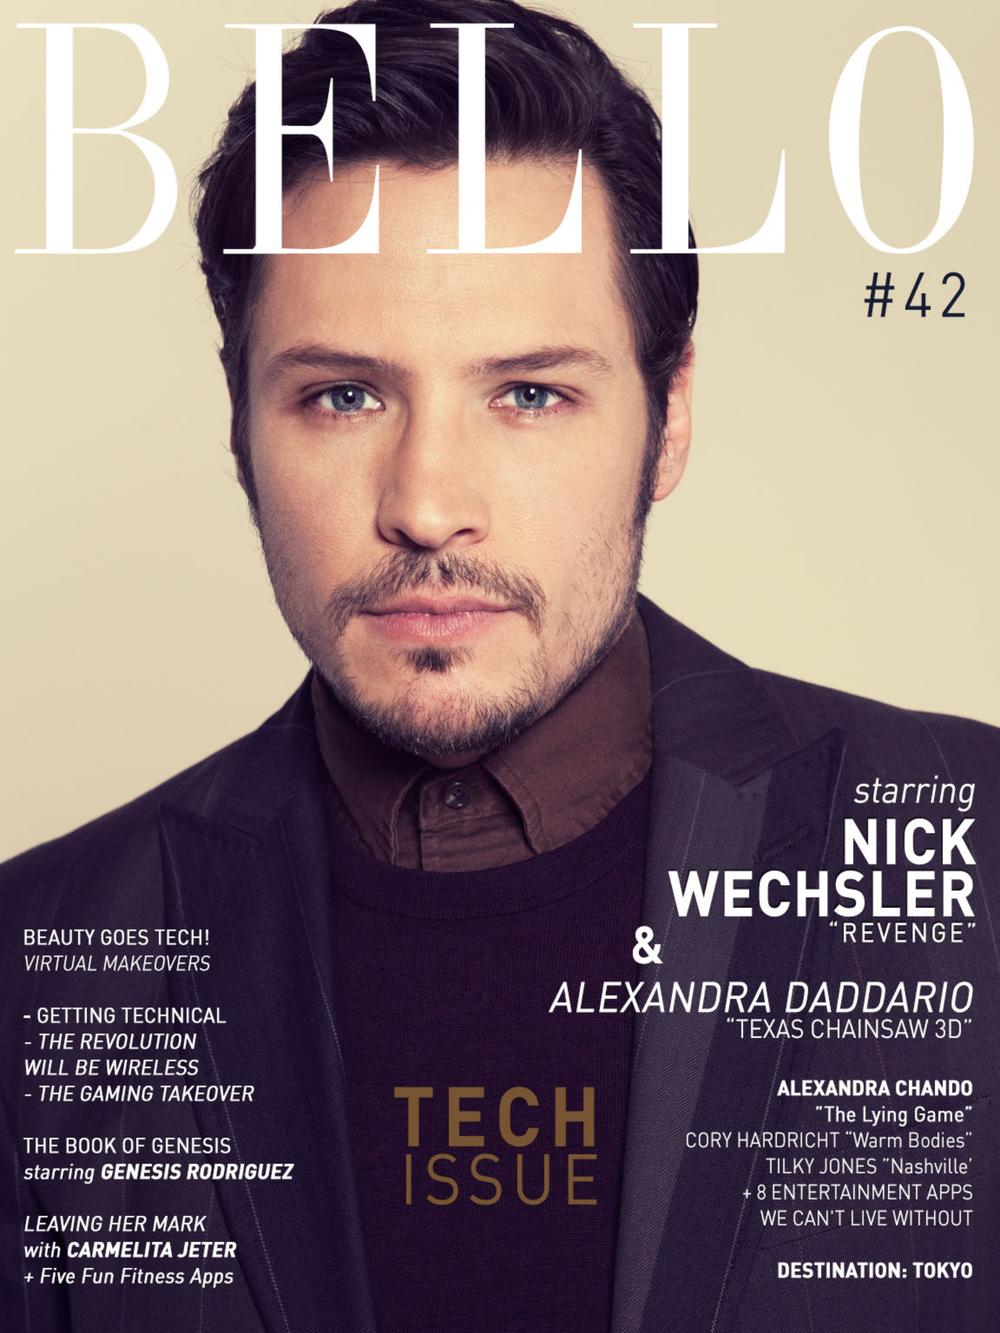 NICK WECHSLER MATHIAS COVER.PNG